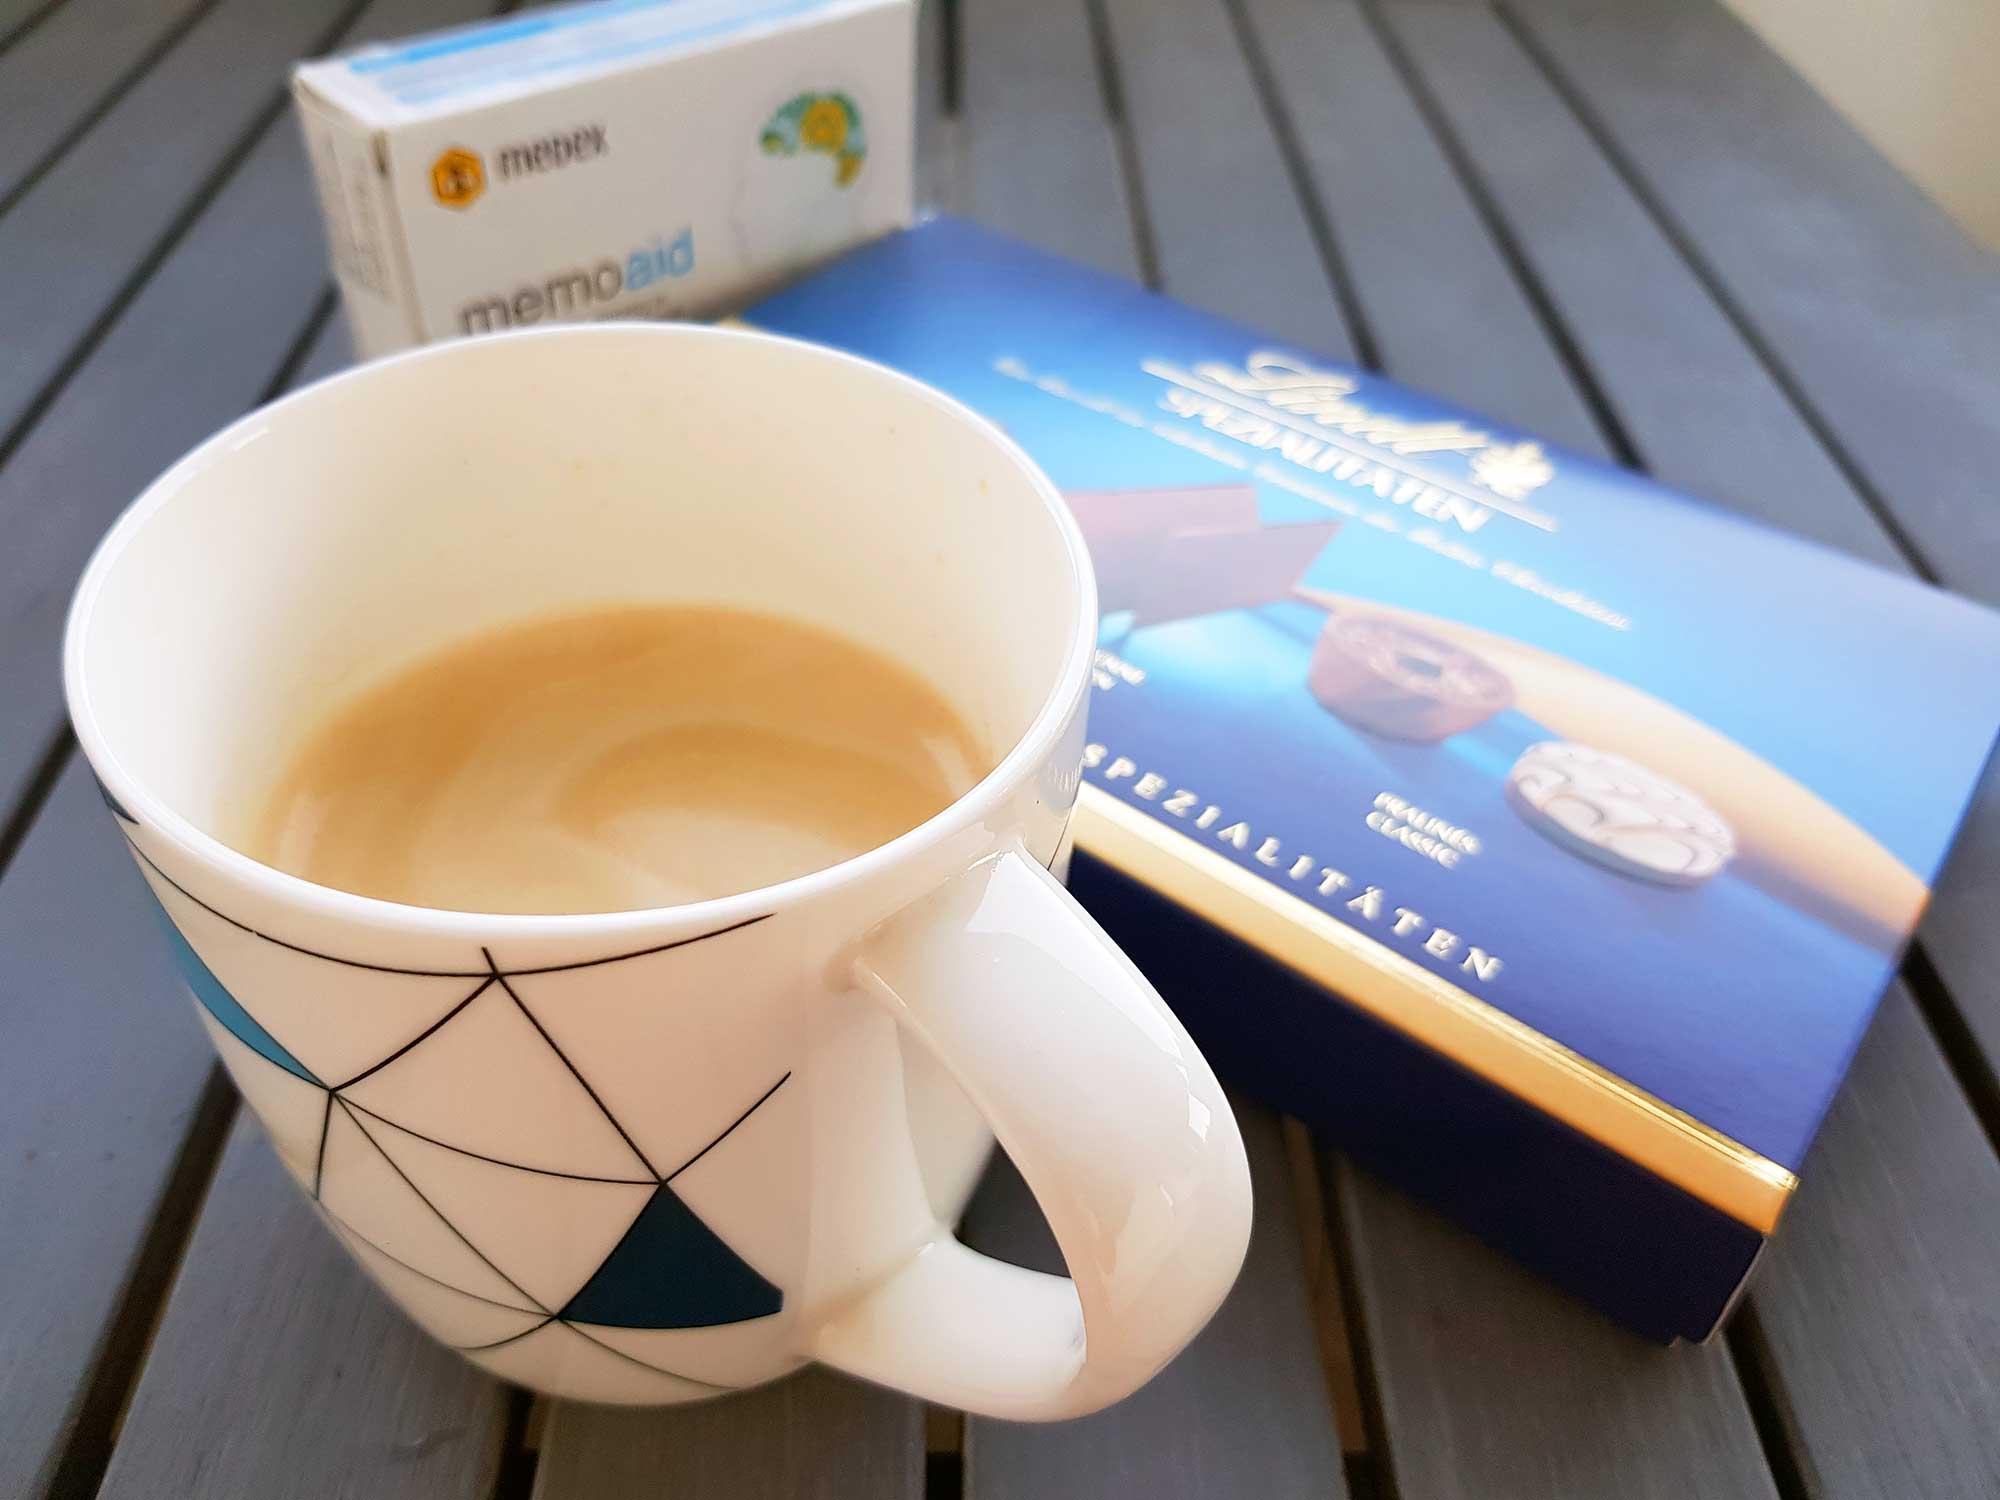 Kava memoadi cokolada